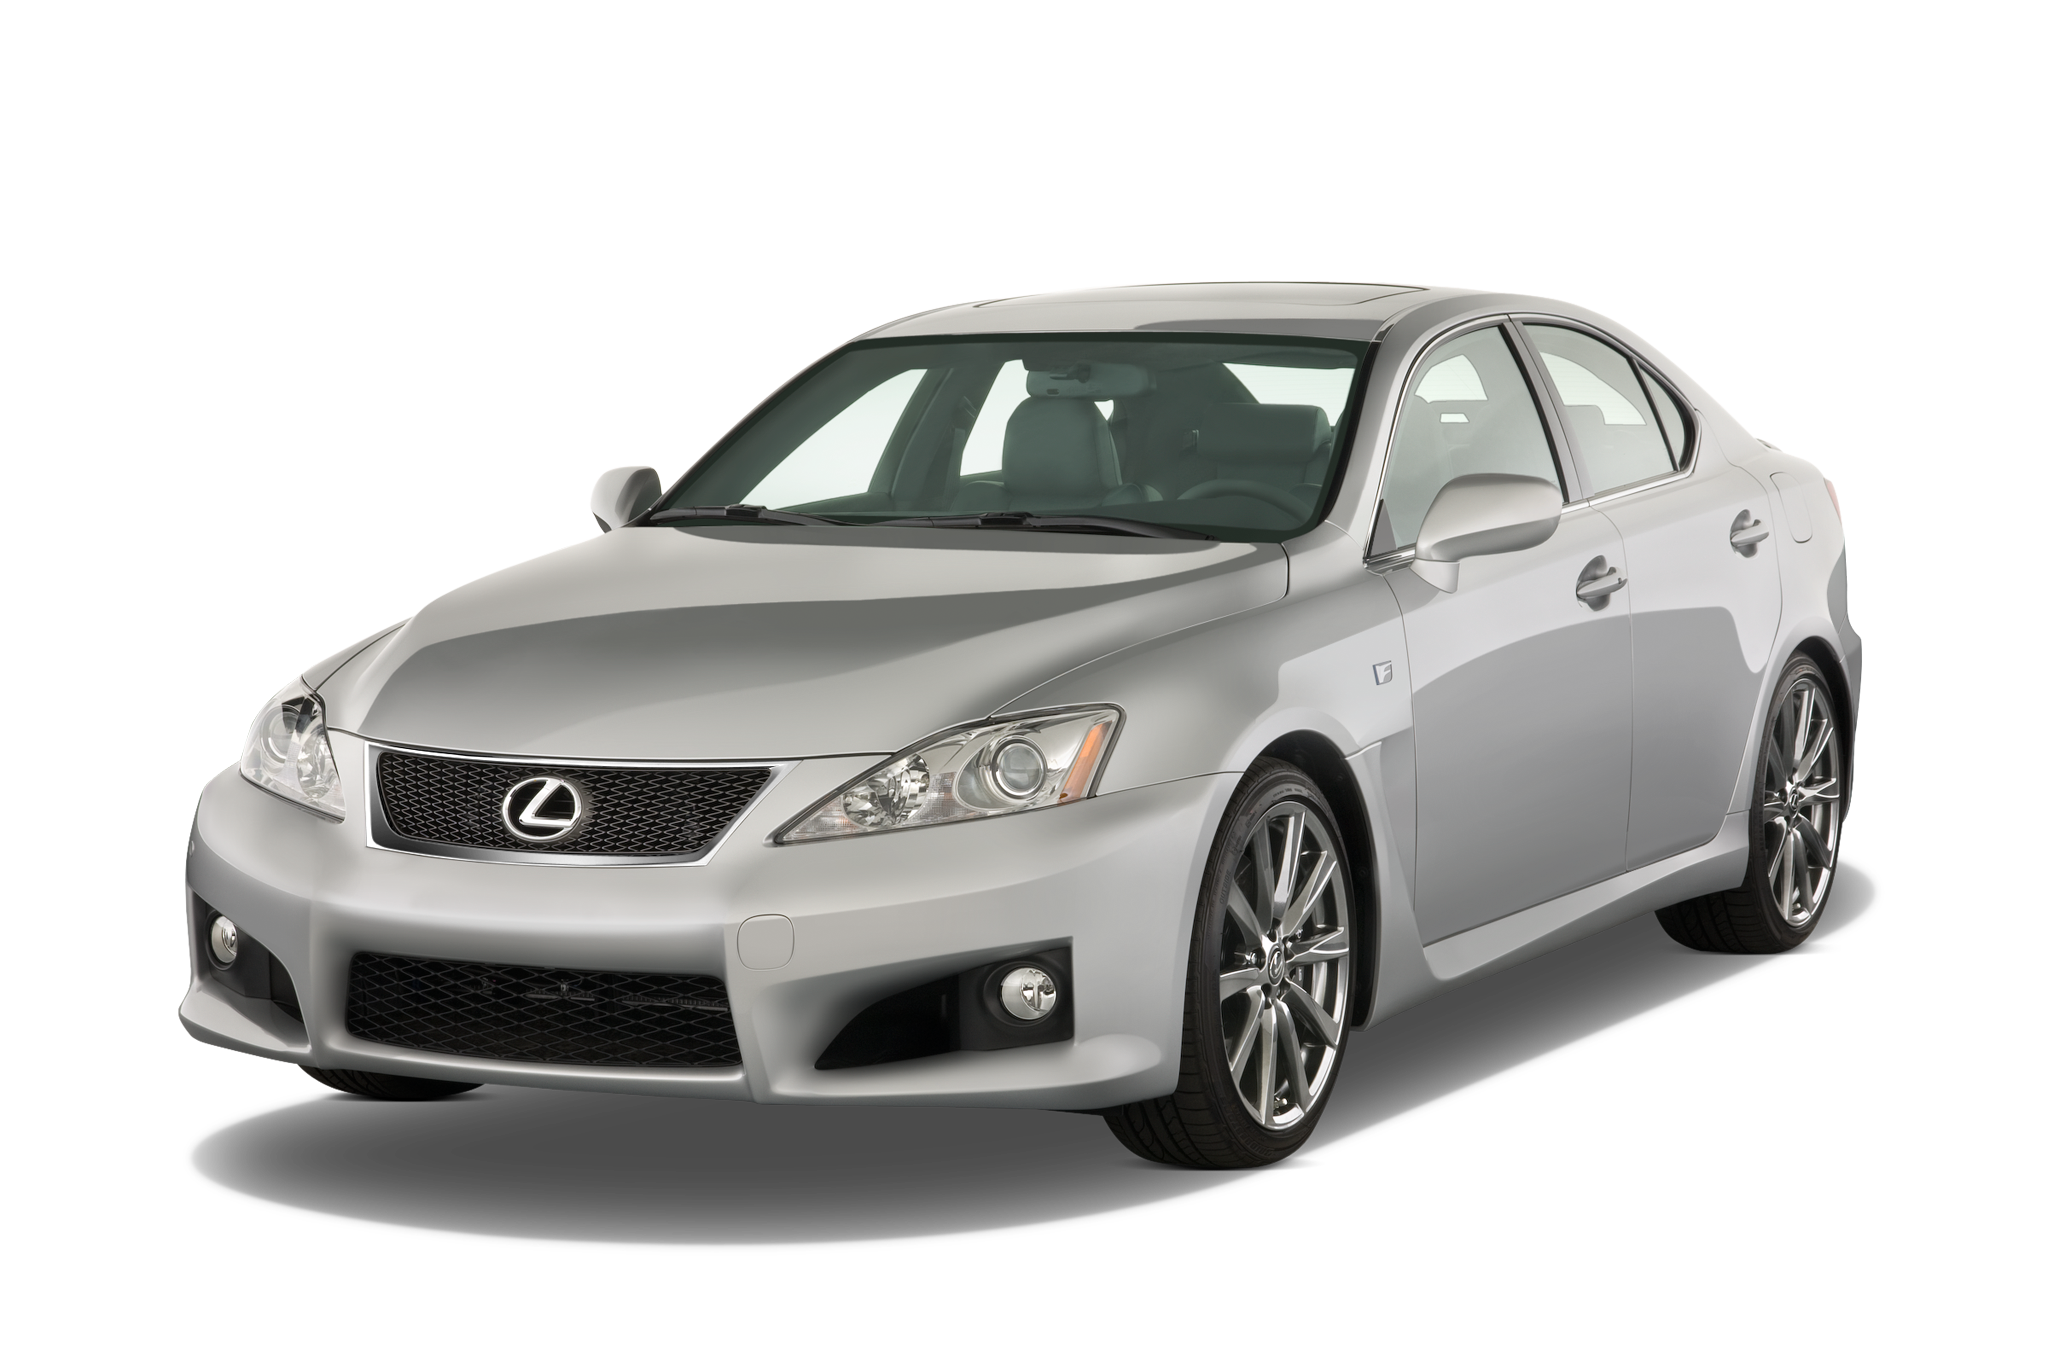 http://st.automobilemag.com/uploads/sites/10/2015/11/2010-lexus-is-f-sedan-angular-front.png